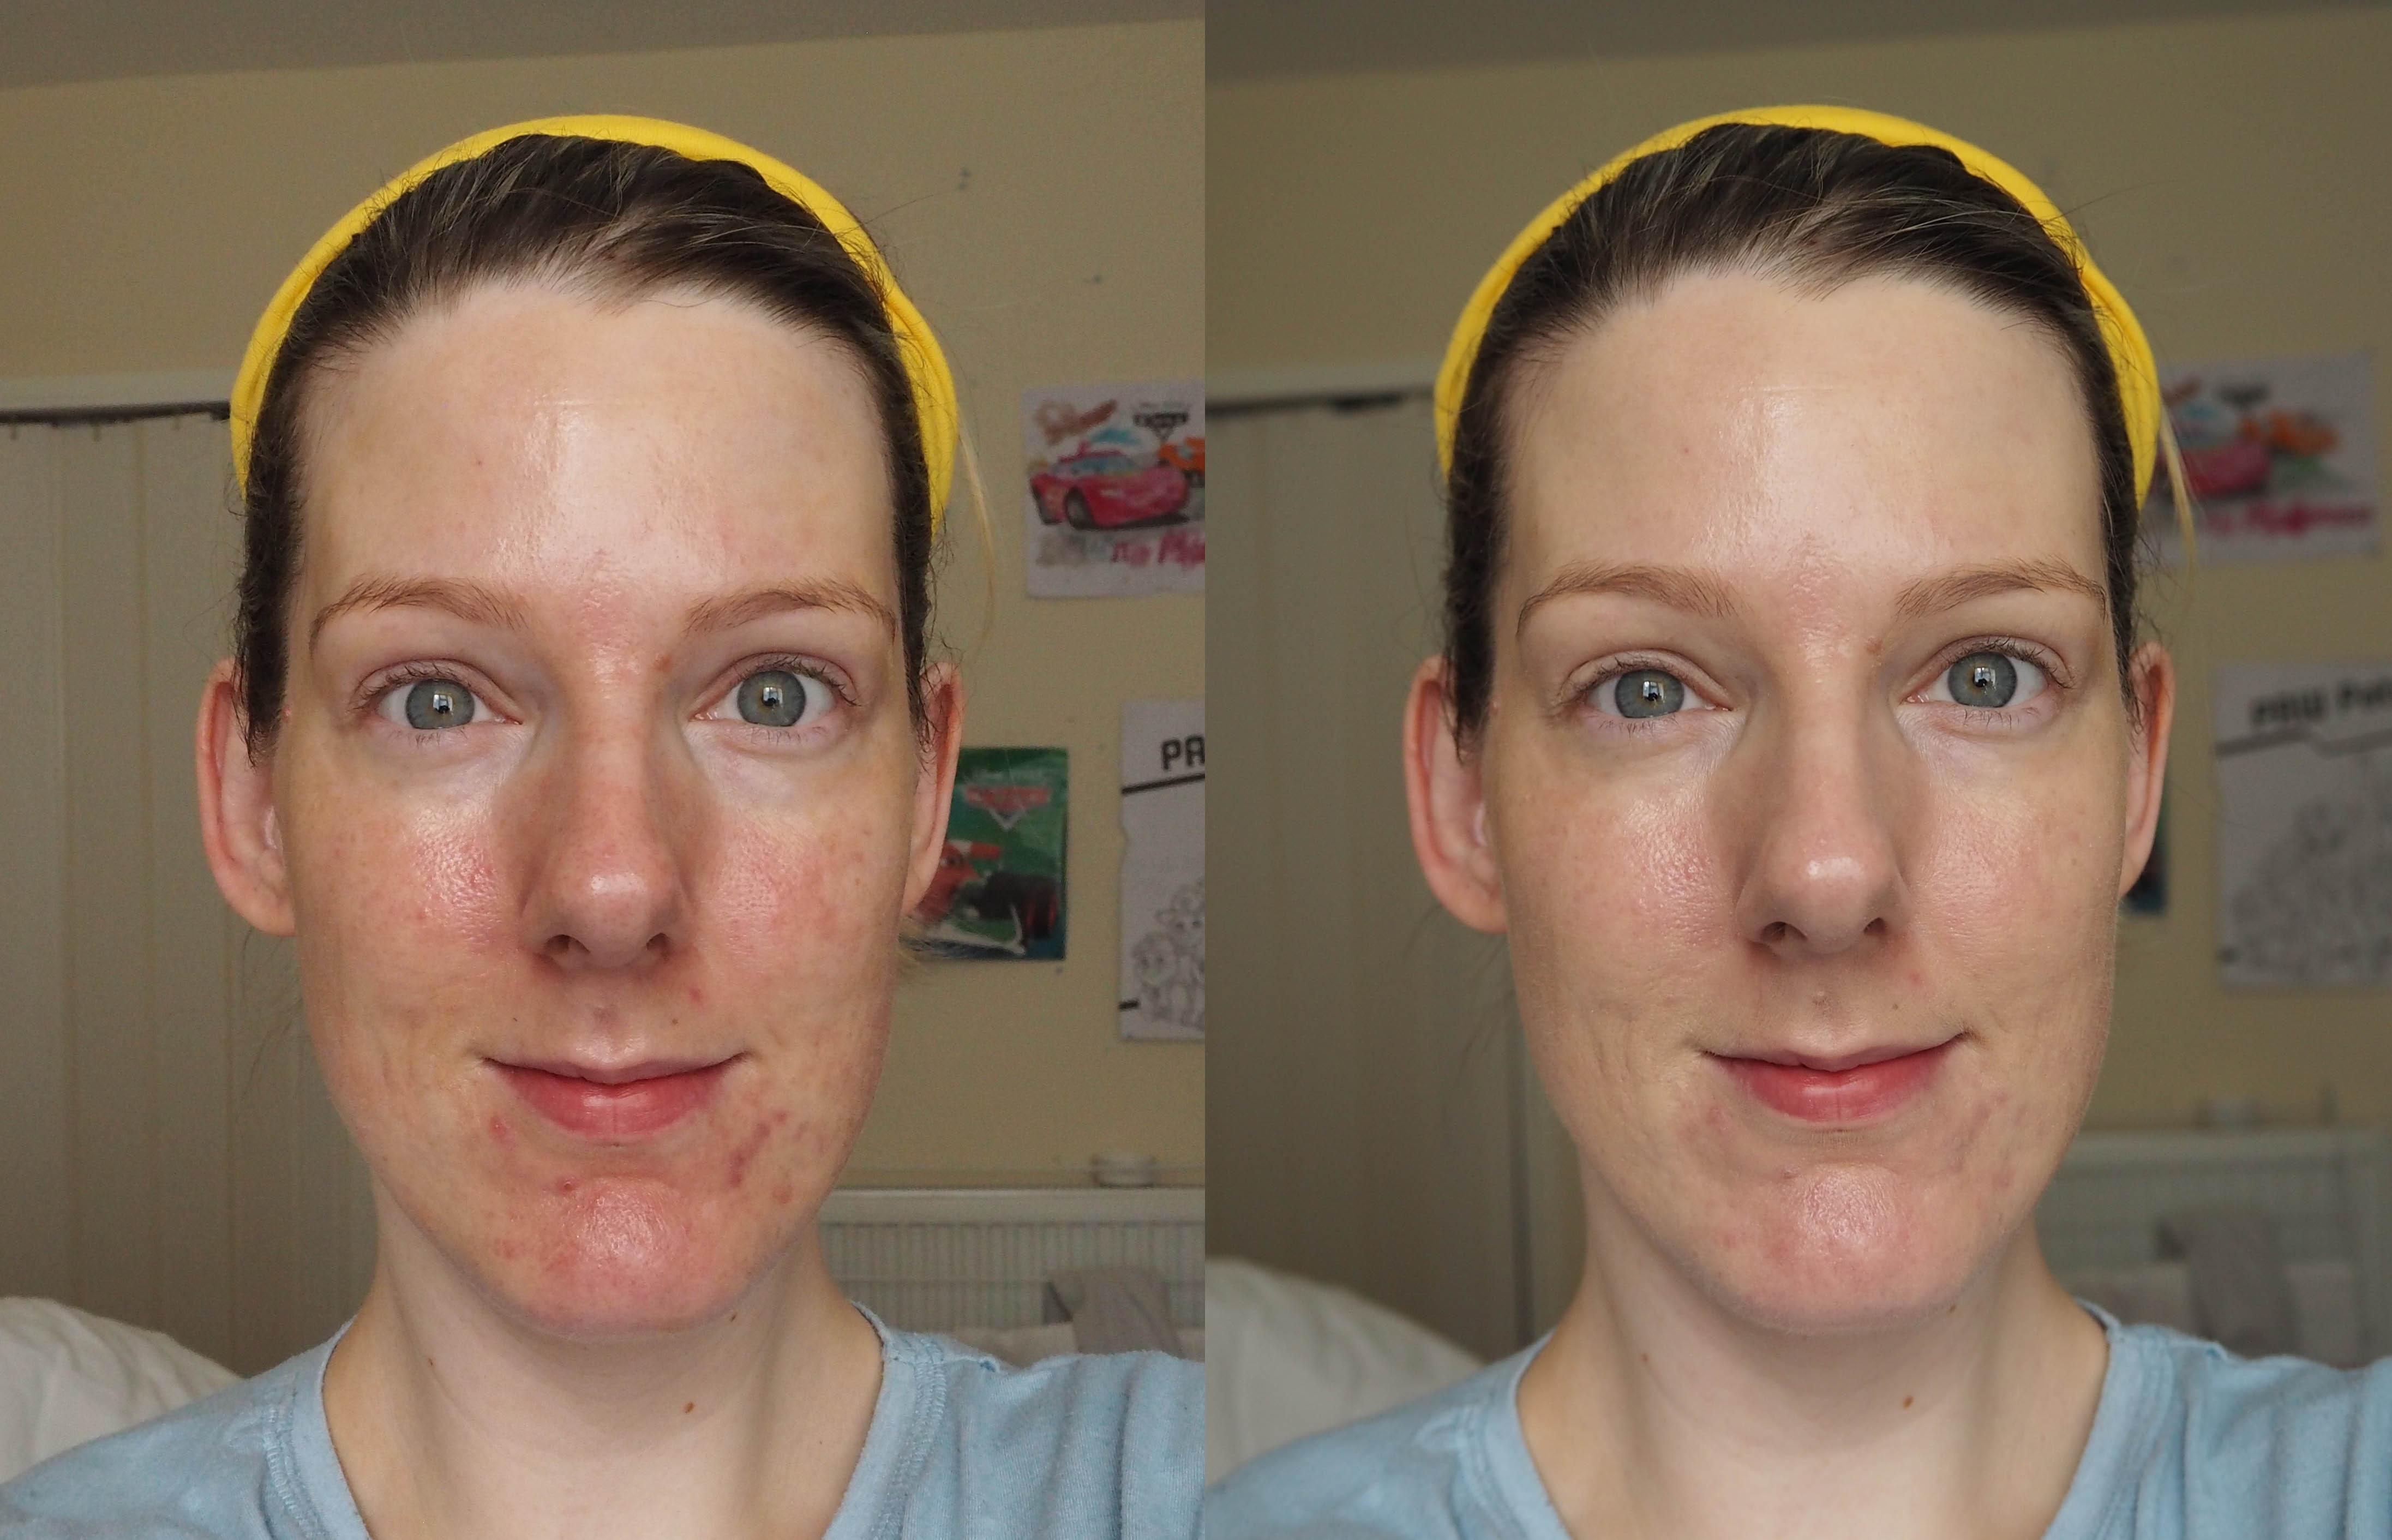 Mac Mineralize Moisture Spf15 Foundation Review Beauty Geek Uk